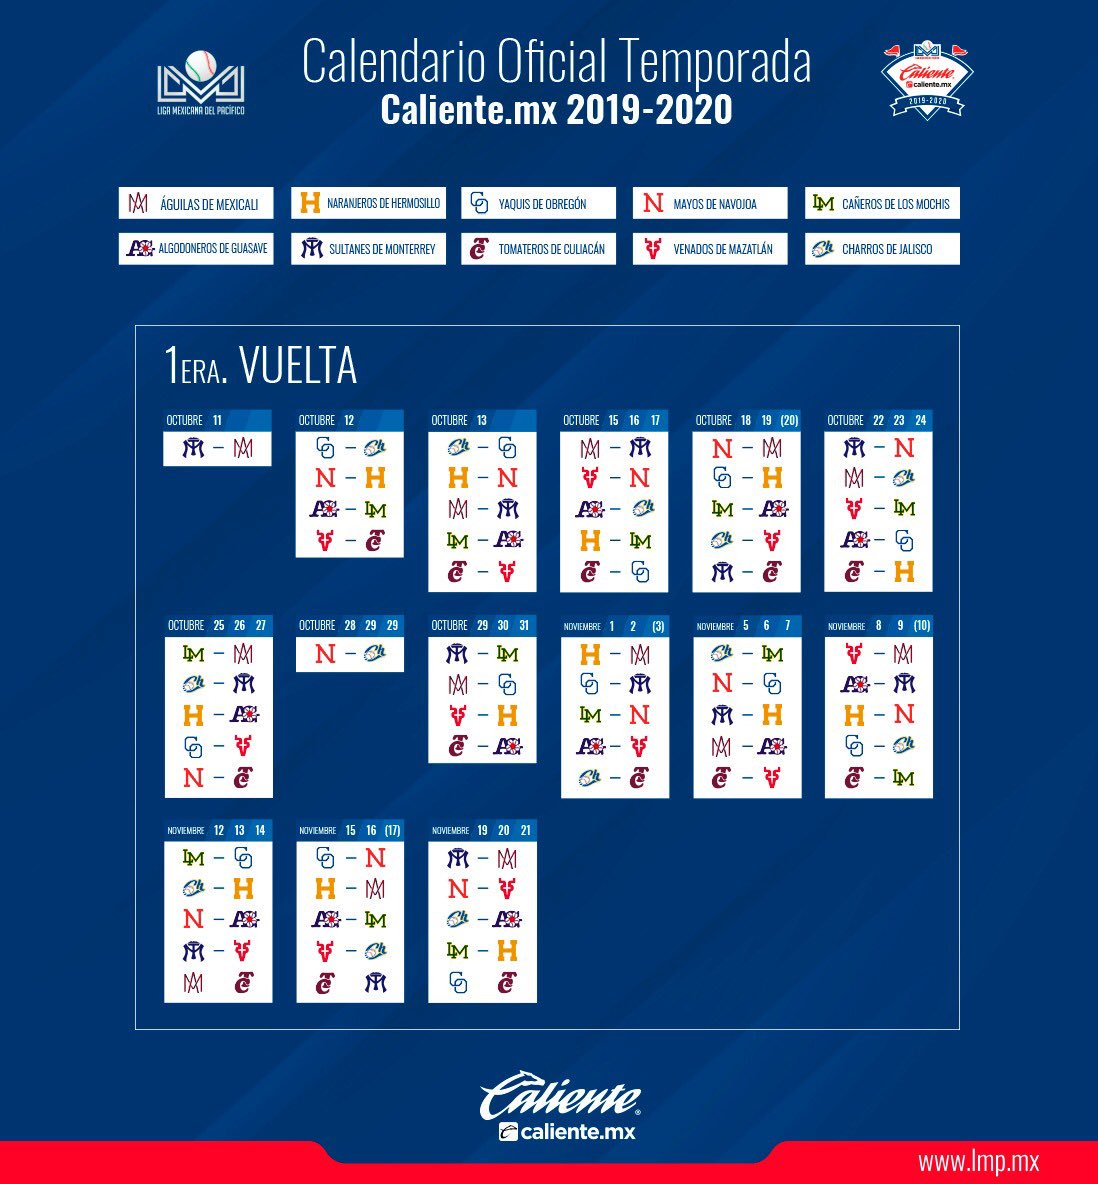 Lmp - @lmpbeisbol Twitter Profile And Downloader | Twipu within Calendario Liga Mx 2019 2020